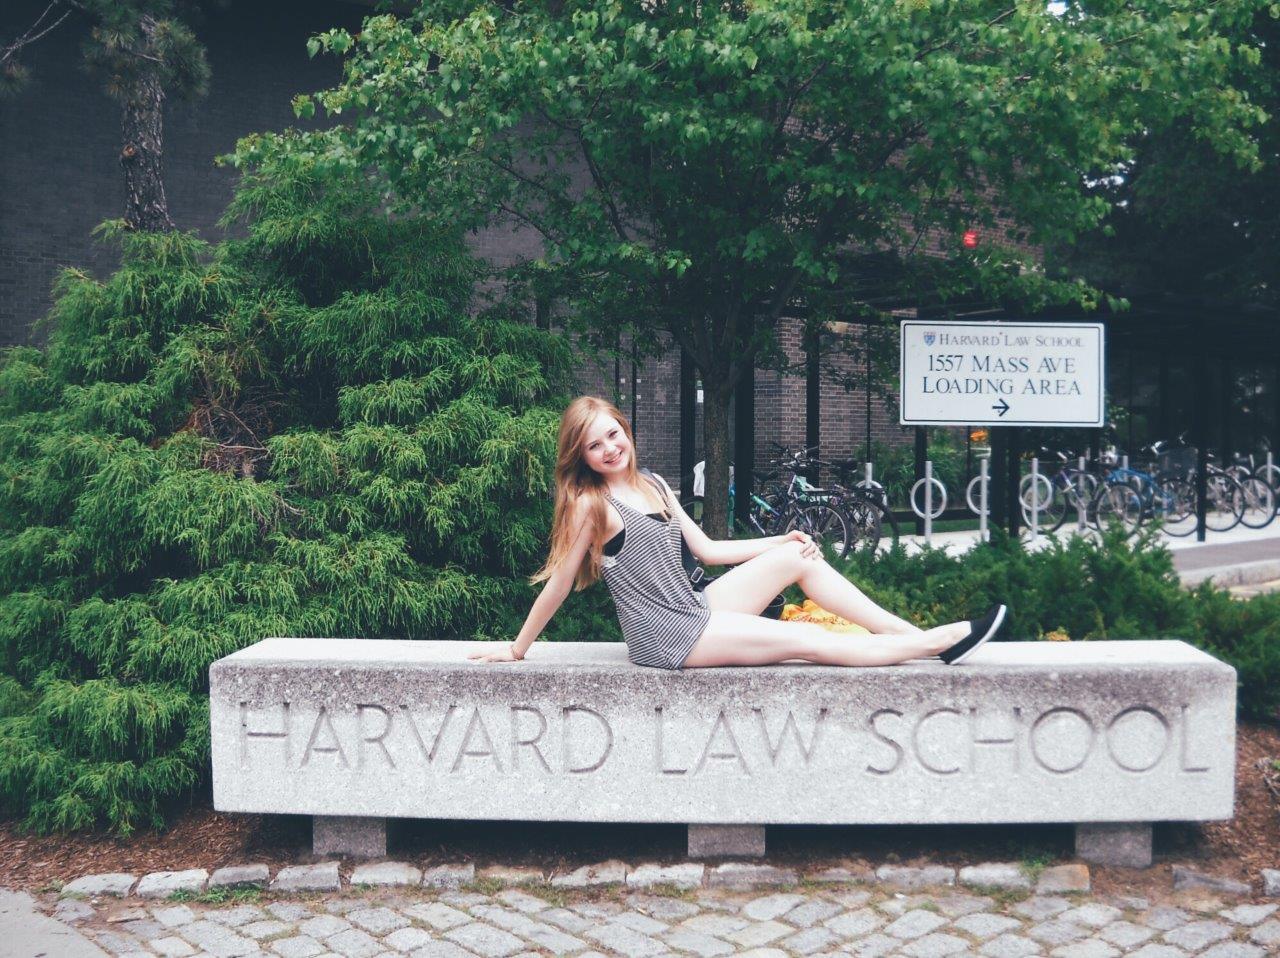 Visiting Harvard University